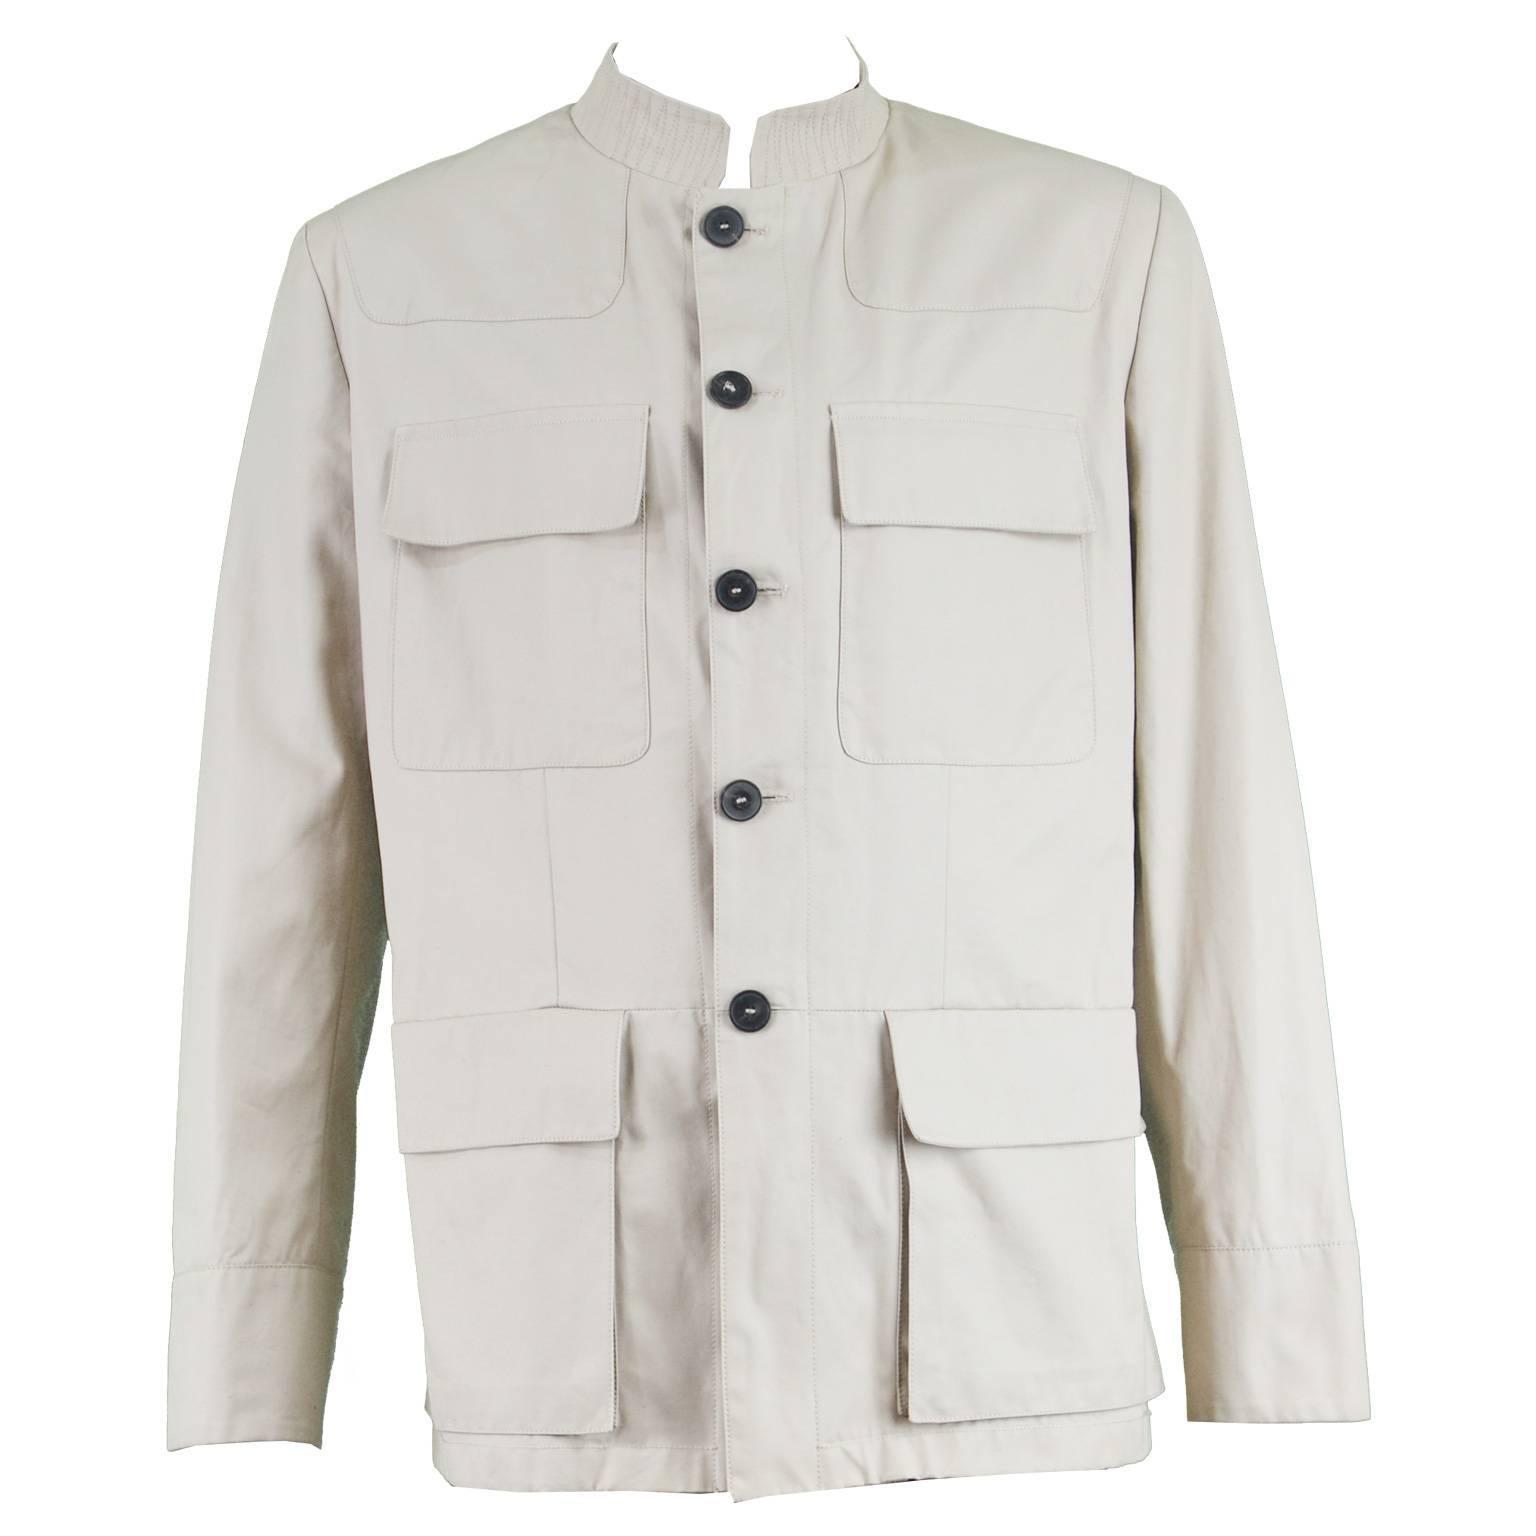 9707c51d65a Yves Saint Laurent Men's Beige Cotton Single Breasted YSL Safari Jacket at  1stdibs